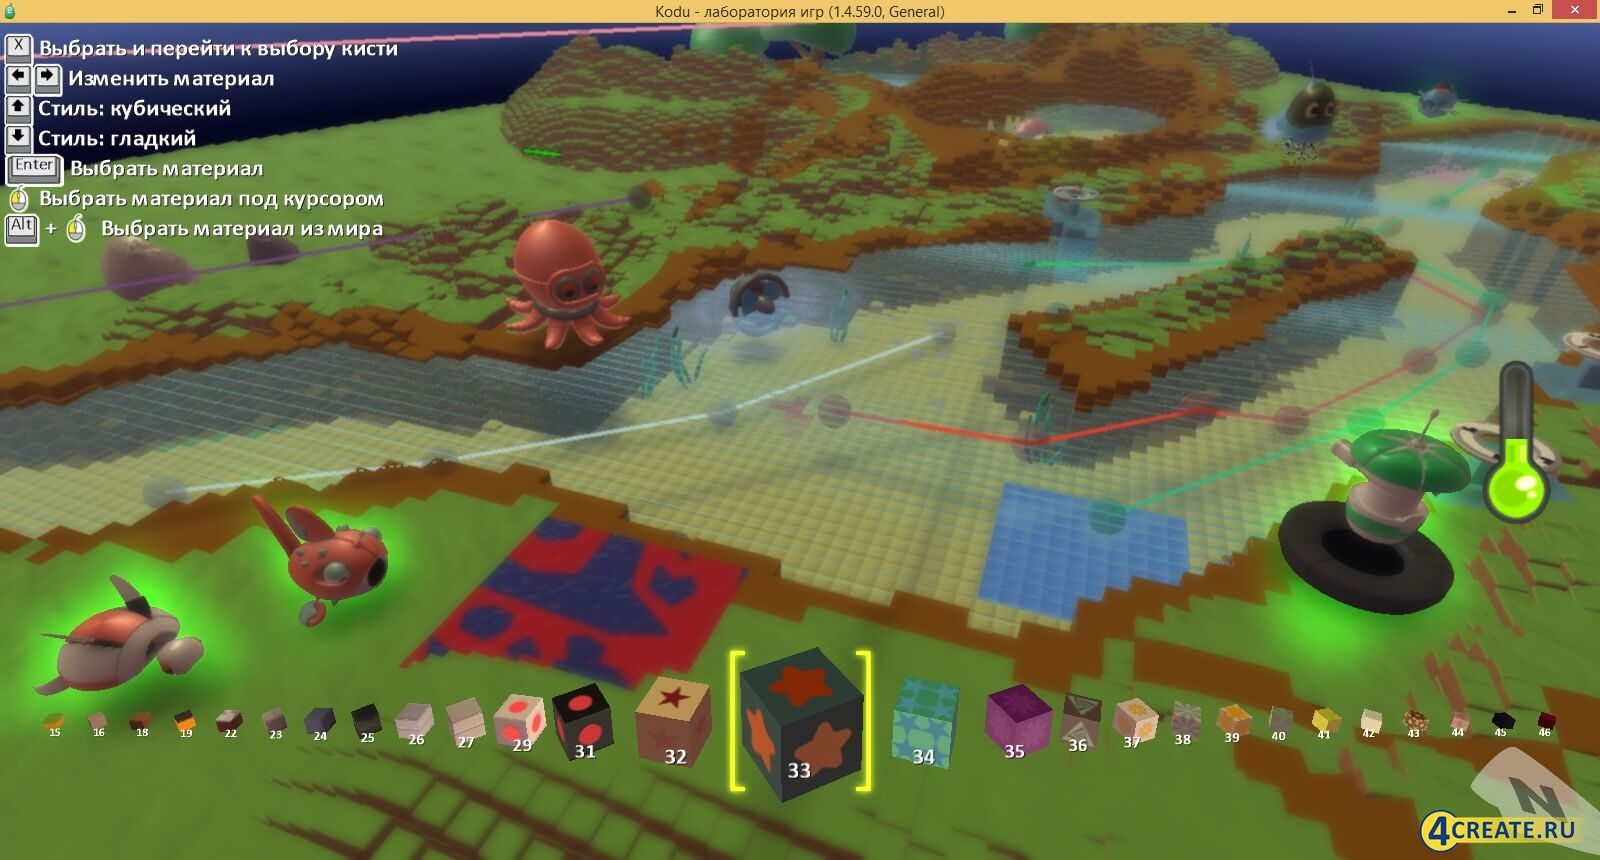 Kodu Game Lab 1.4 (Скриншот 4)